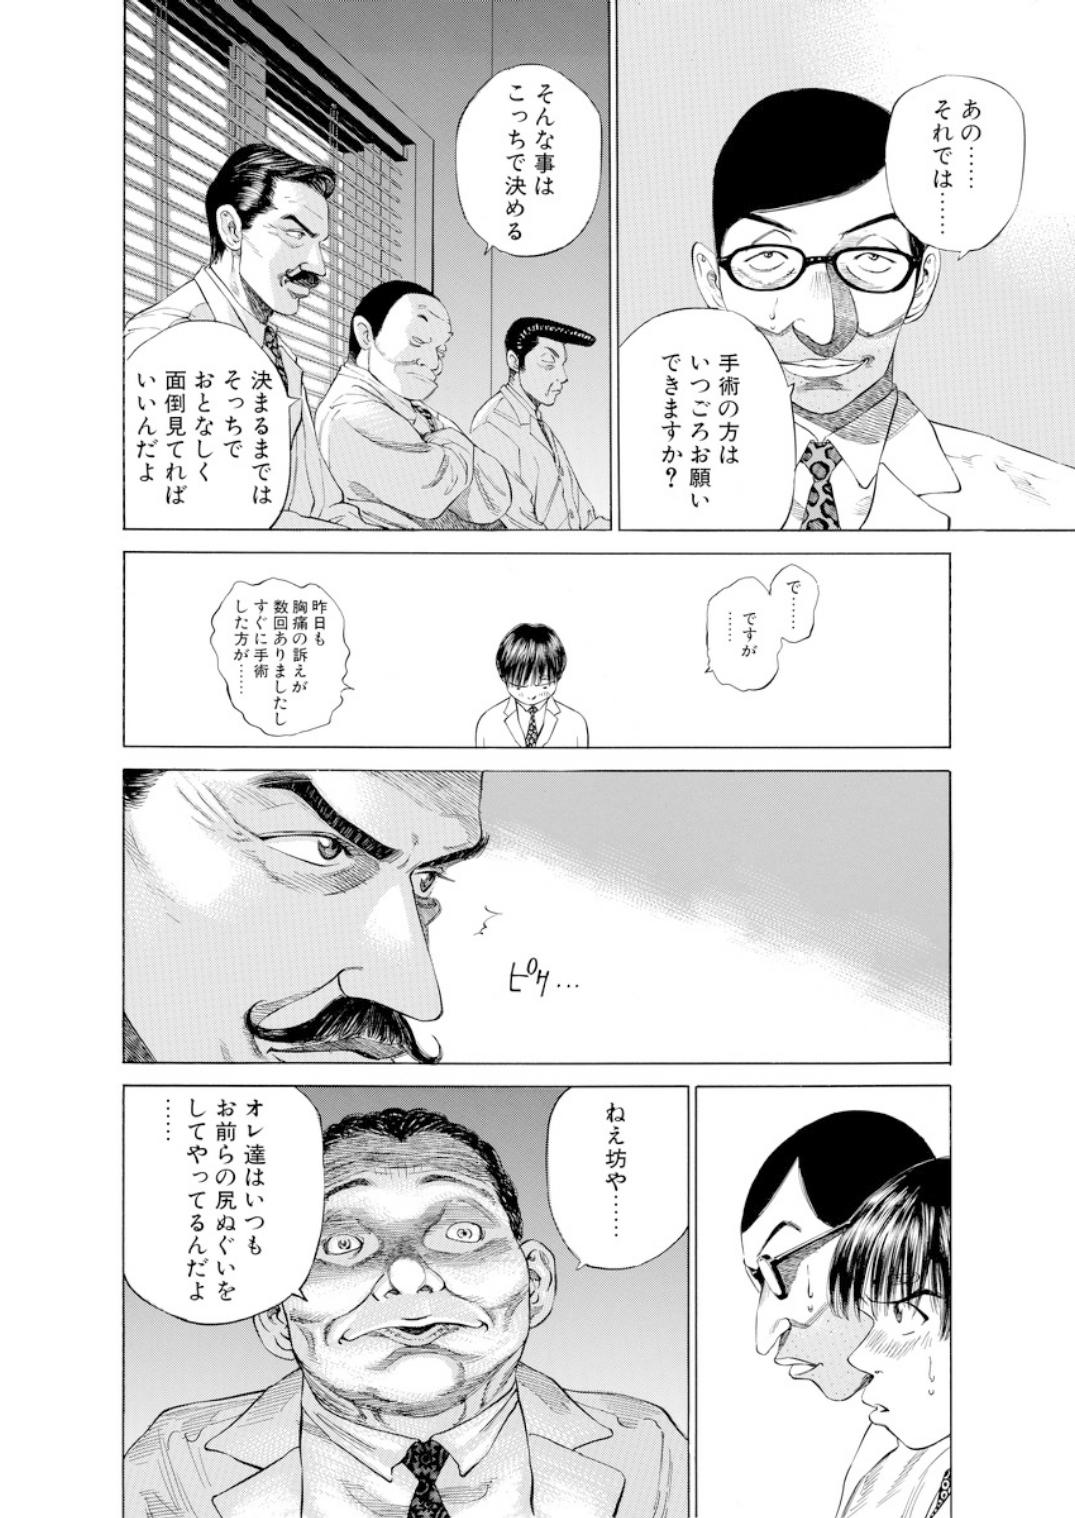 001bj_page-0198.jpg